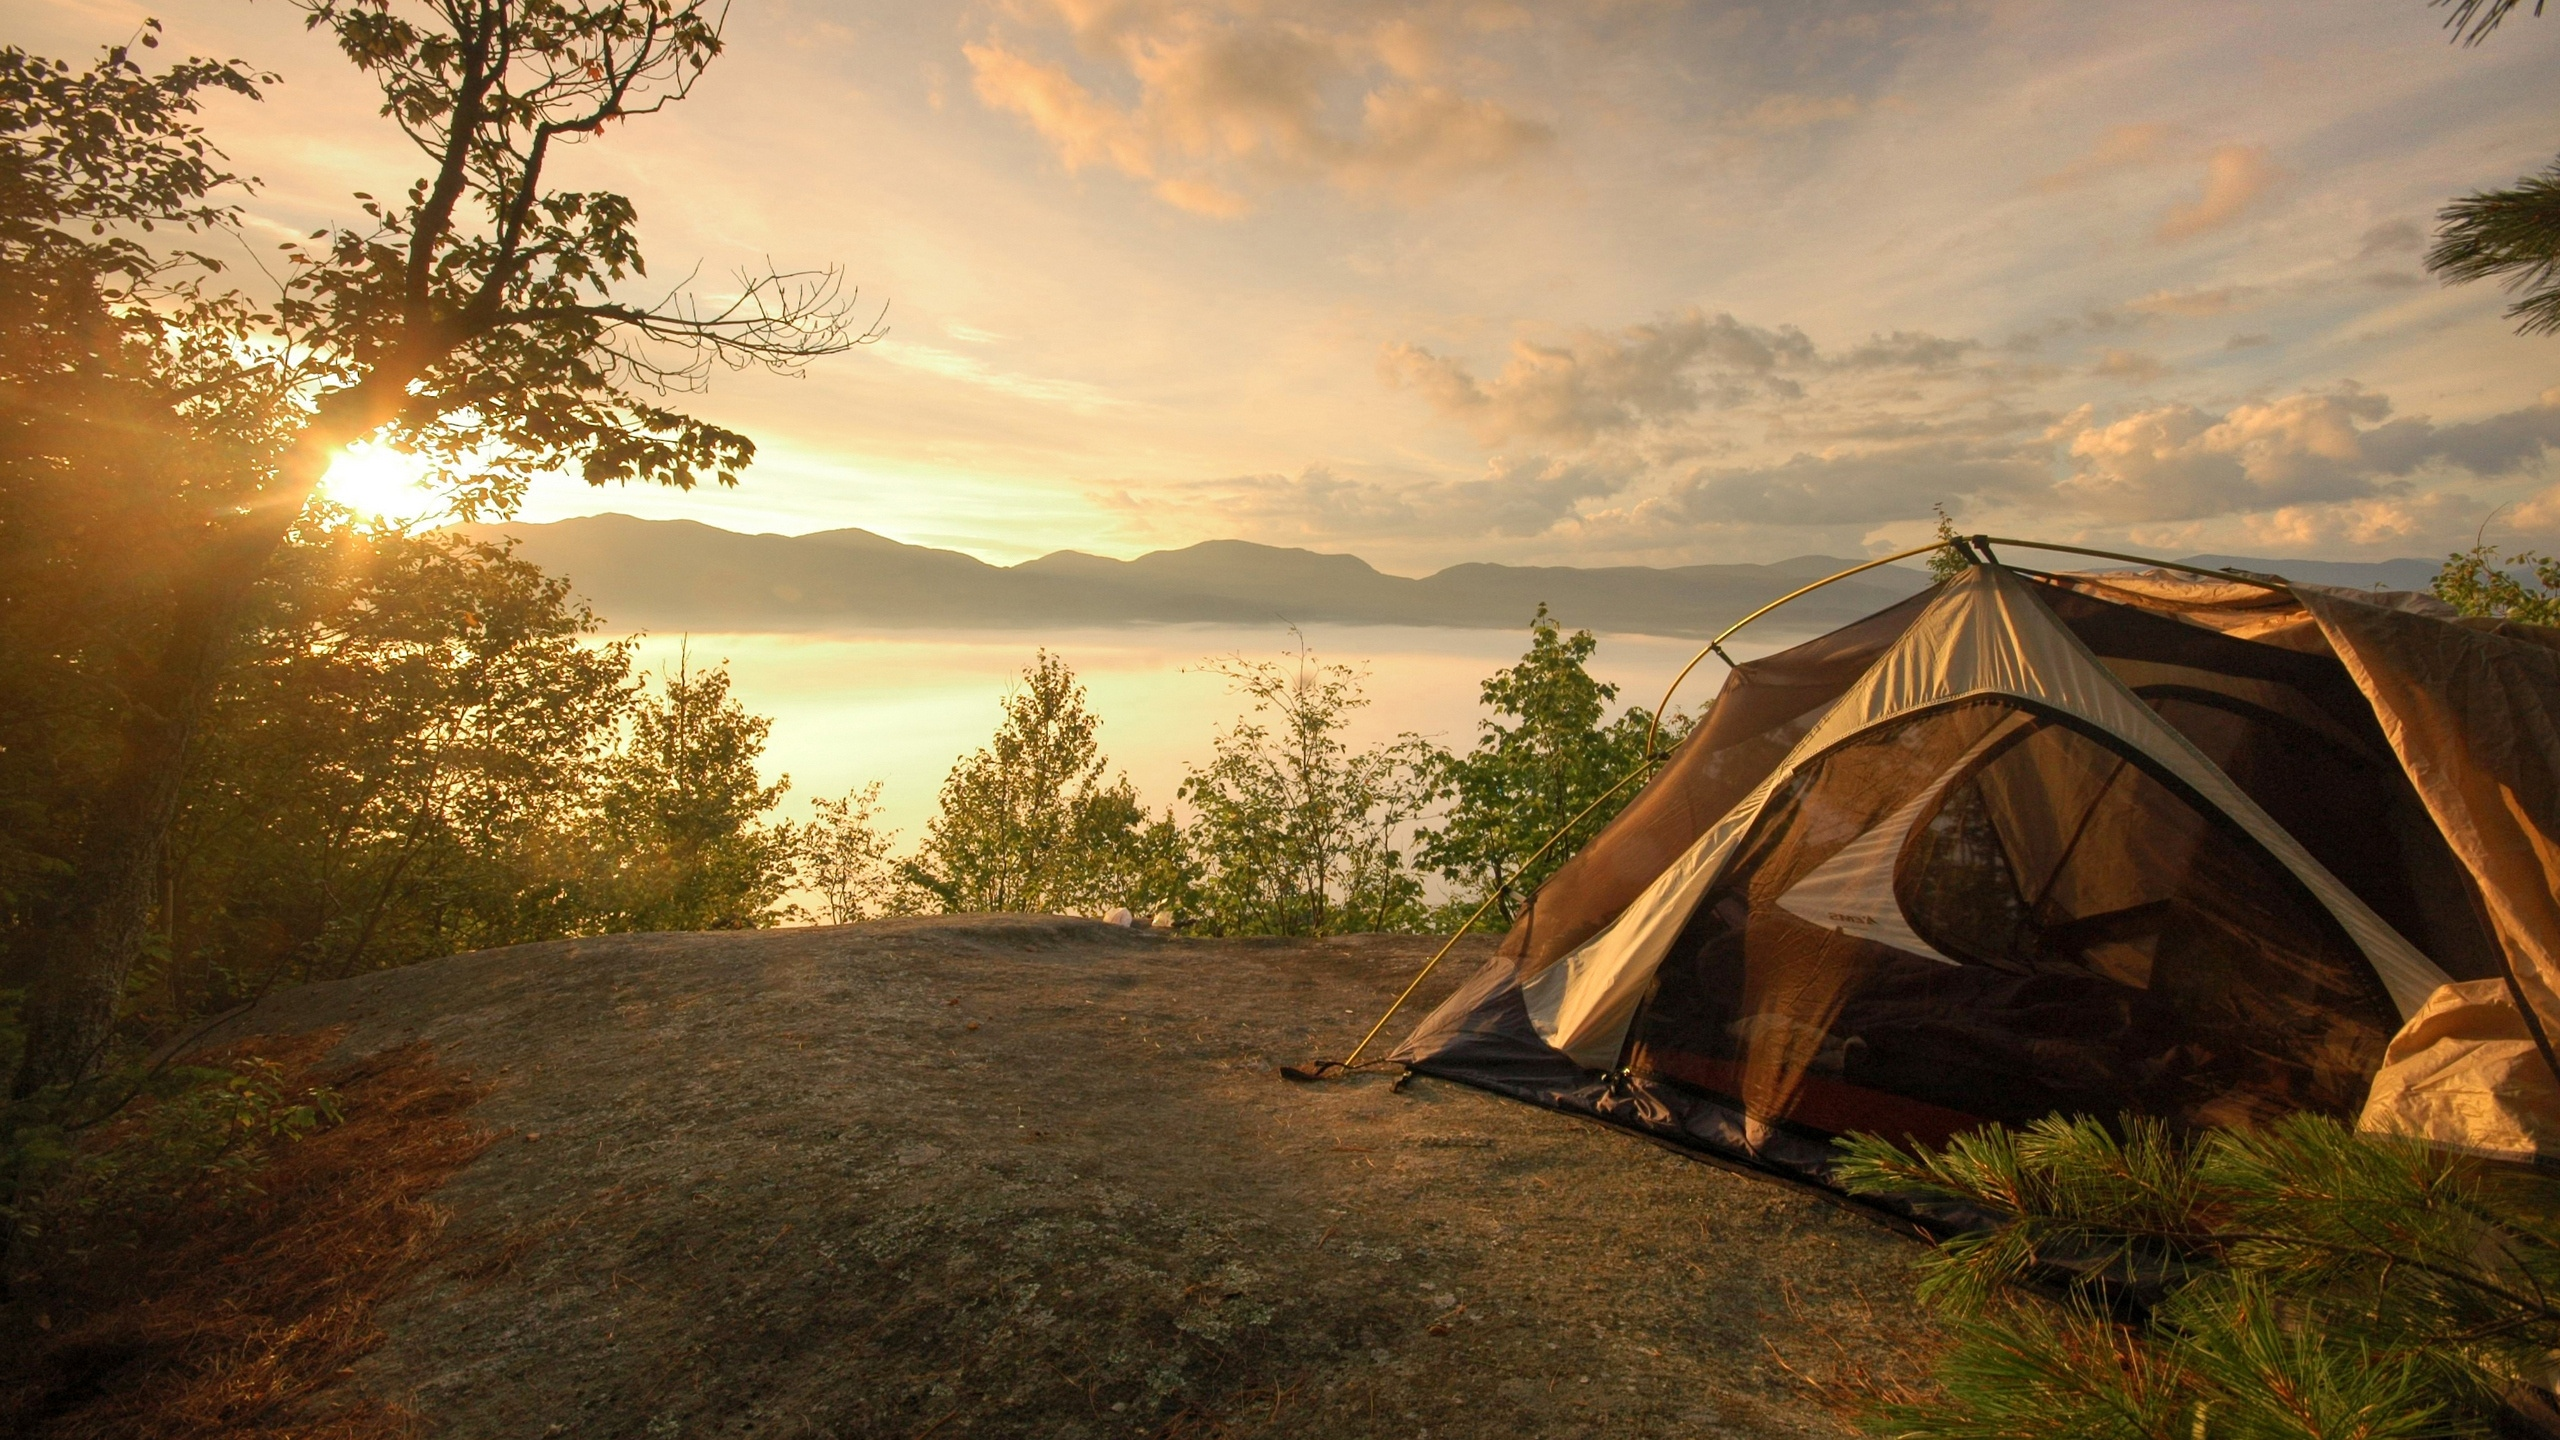 Tent coast lake decline romanticism sky 61524 2560x1440